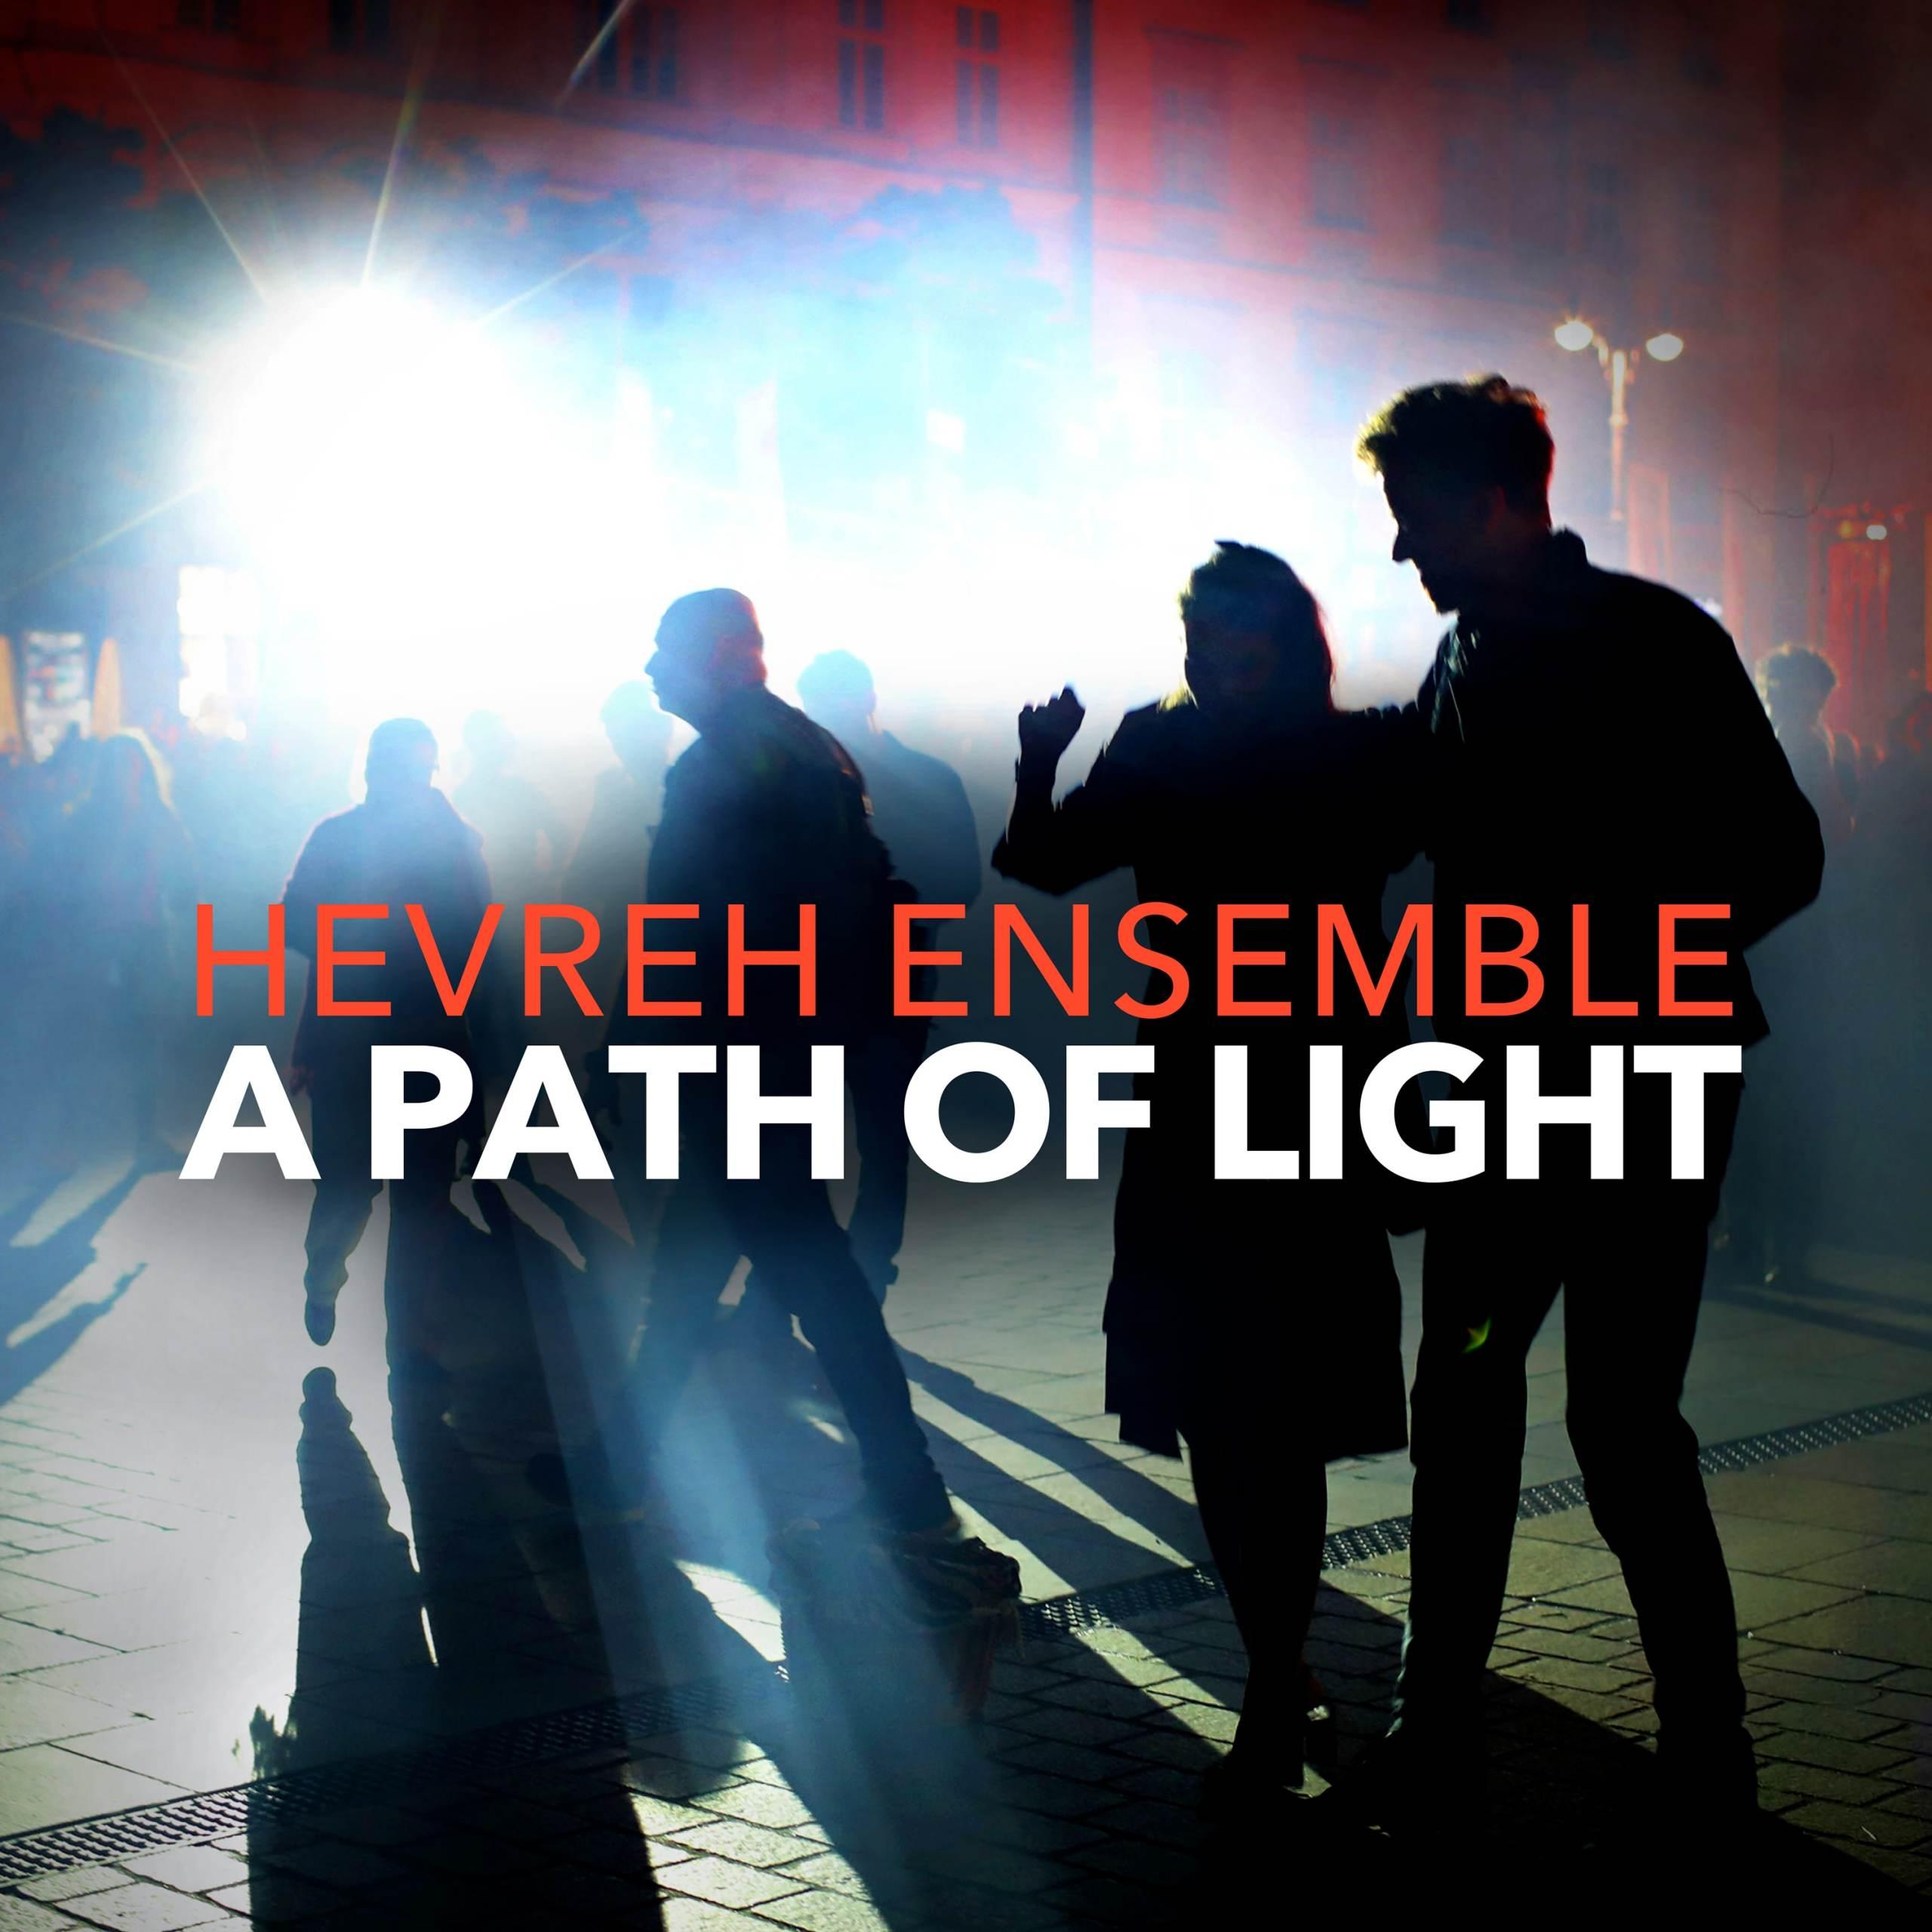 A PATH OF LIGHT - Hevreh Ensemble - album cover